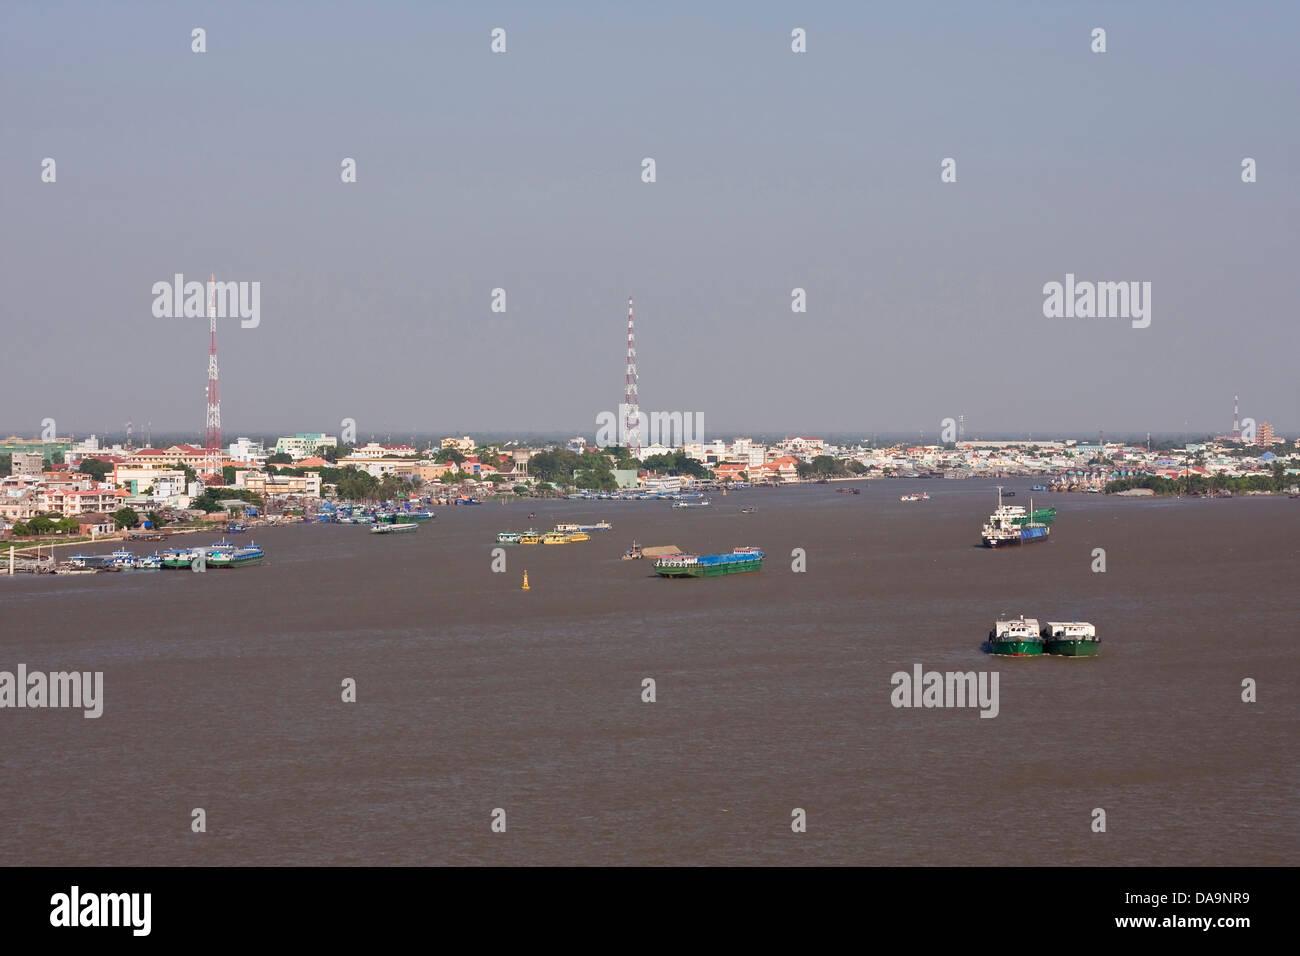 Asien, Boot, Delta, Fluss, Flüsse, Haus, Haus, Leben, Mekong, mein, Schiff, Stadt, Stadt, Stream, Tho, transport, Stockbild